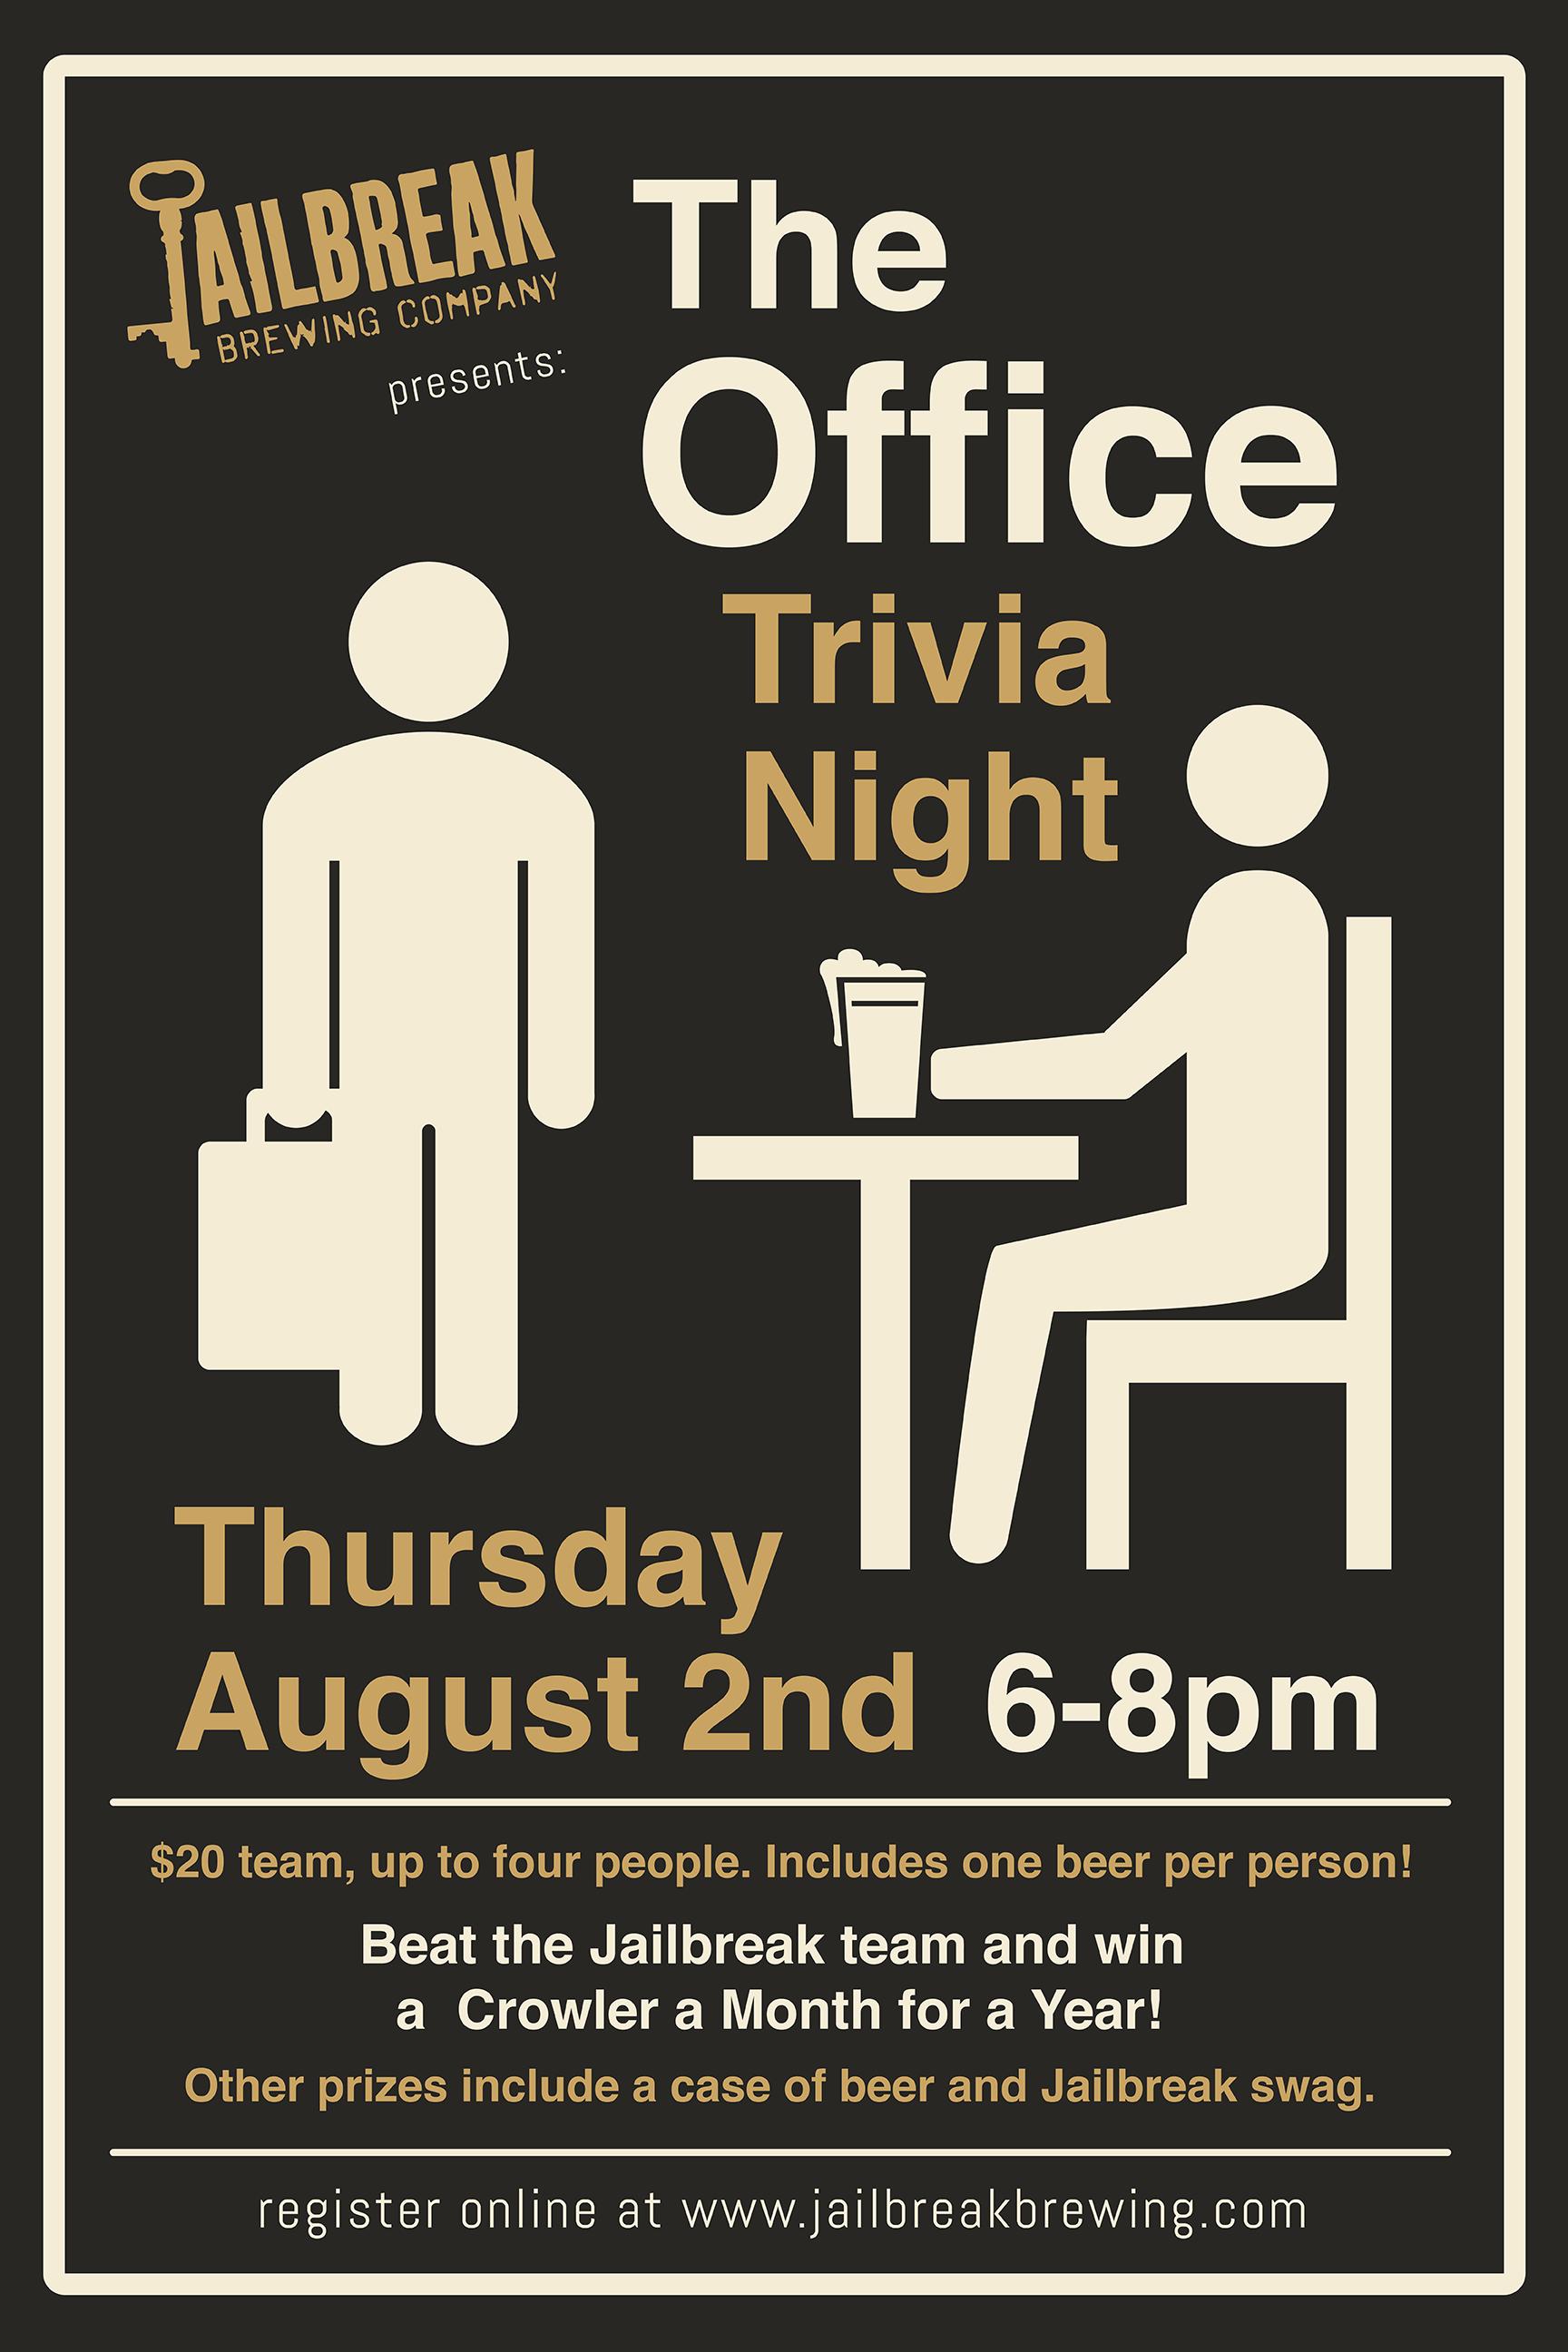 The Office Trivia Night - Jailbreak Brewing Company